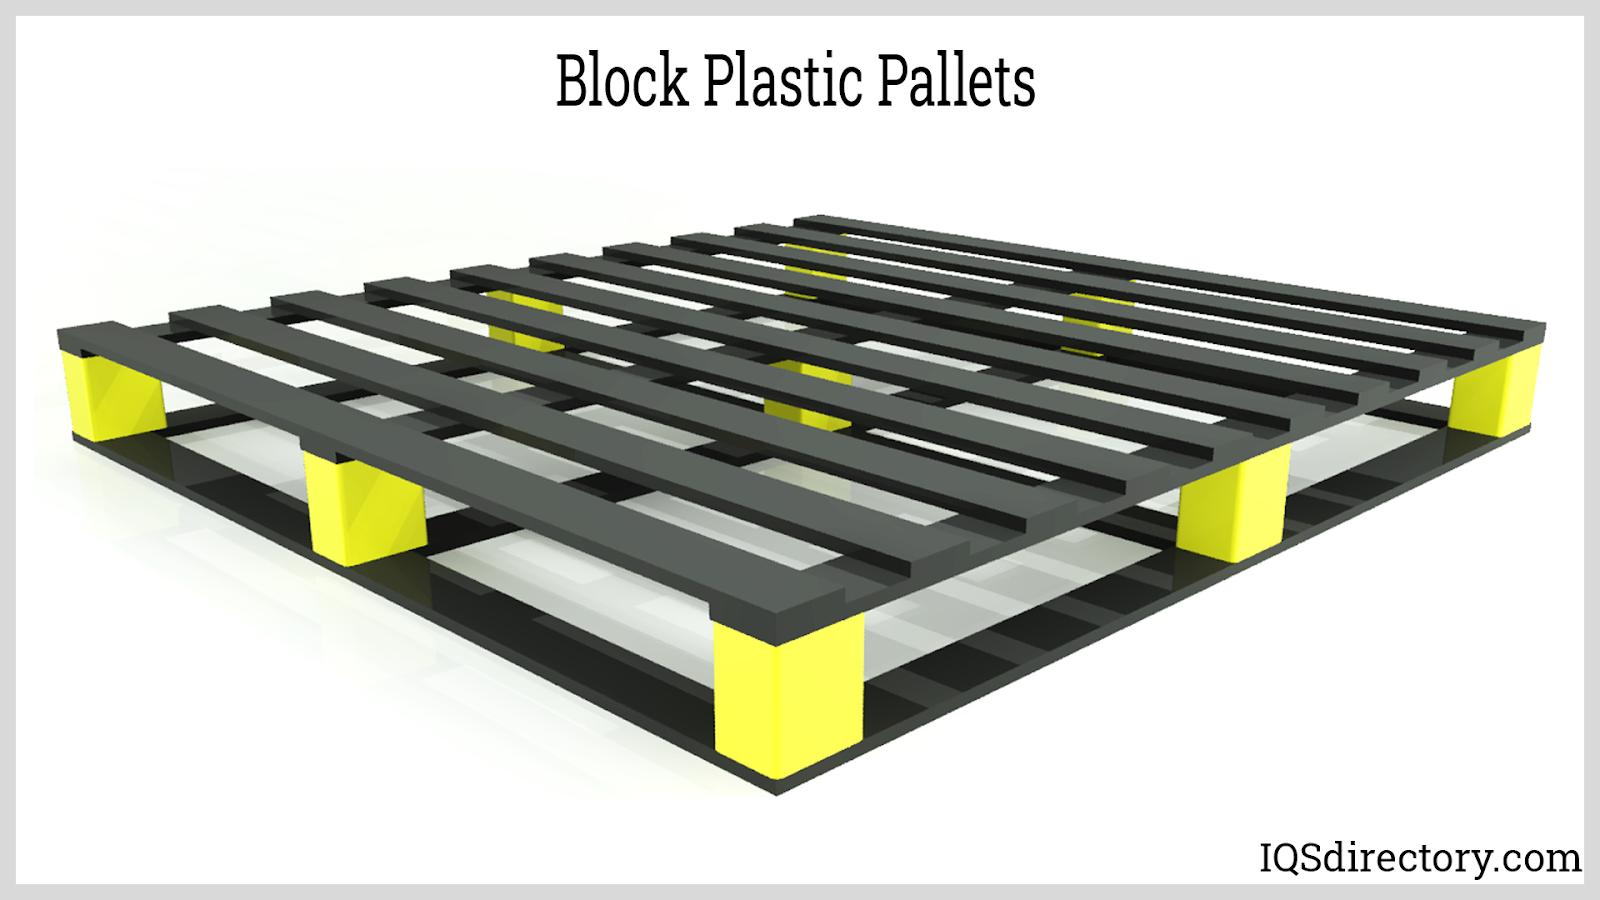 Block Plastic Pallets